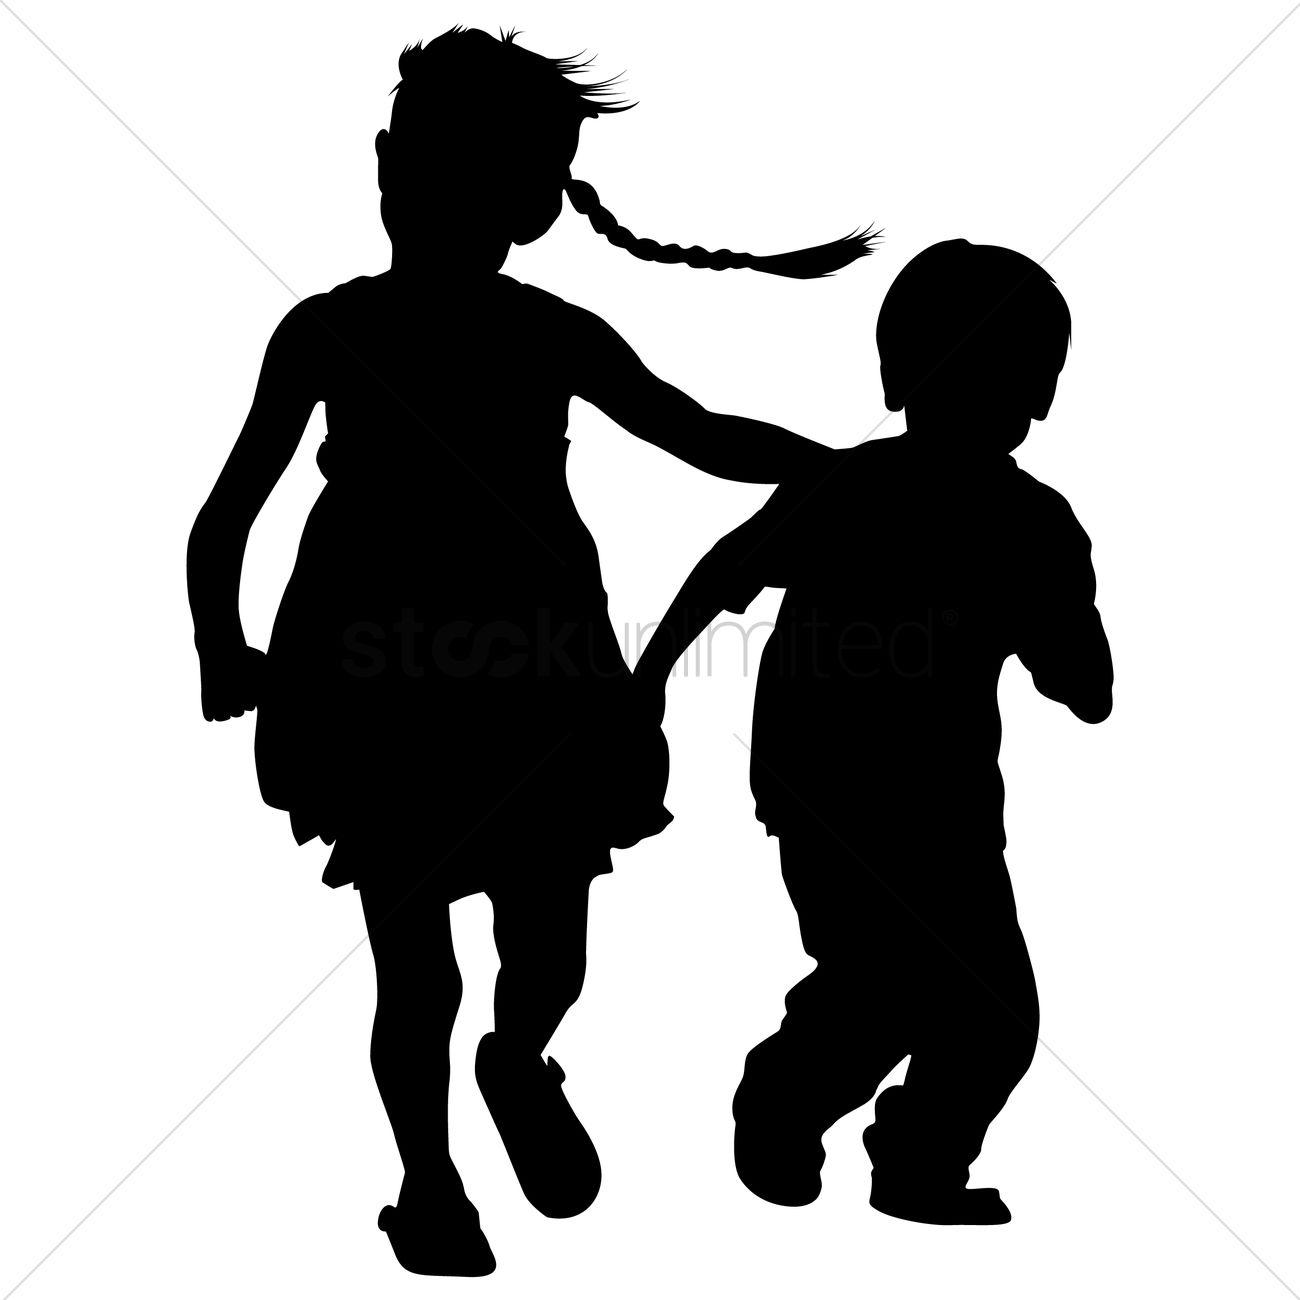 children playing silhouette - photo #16